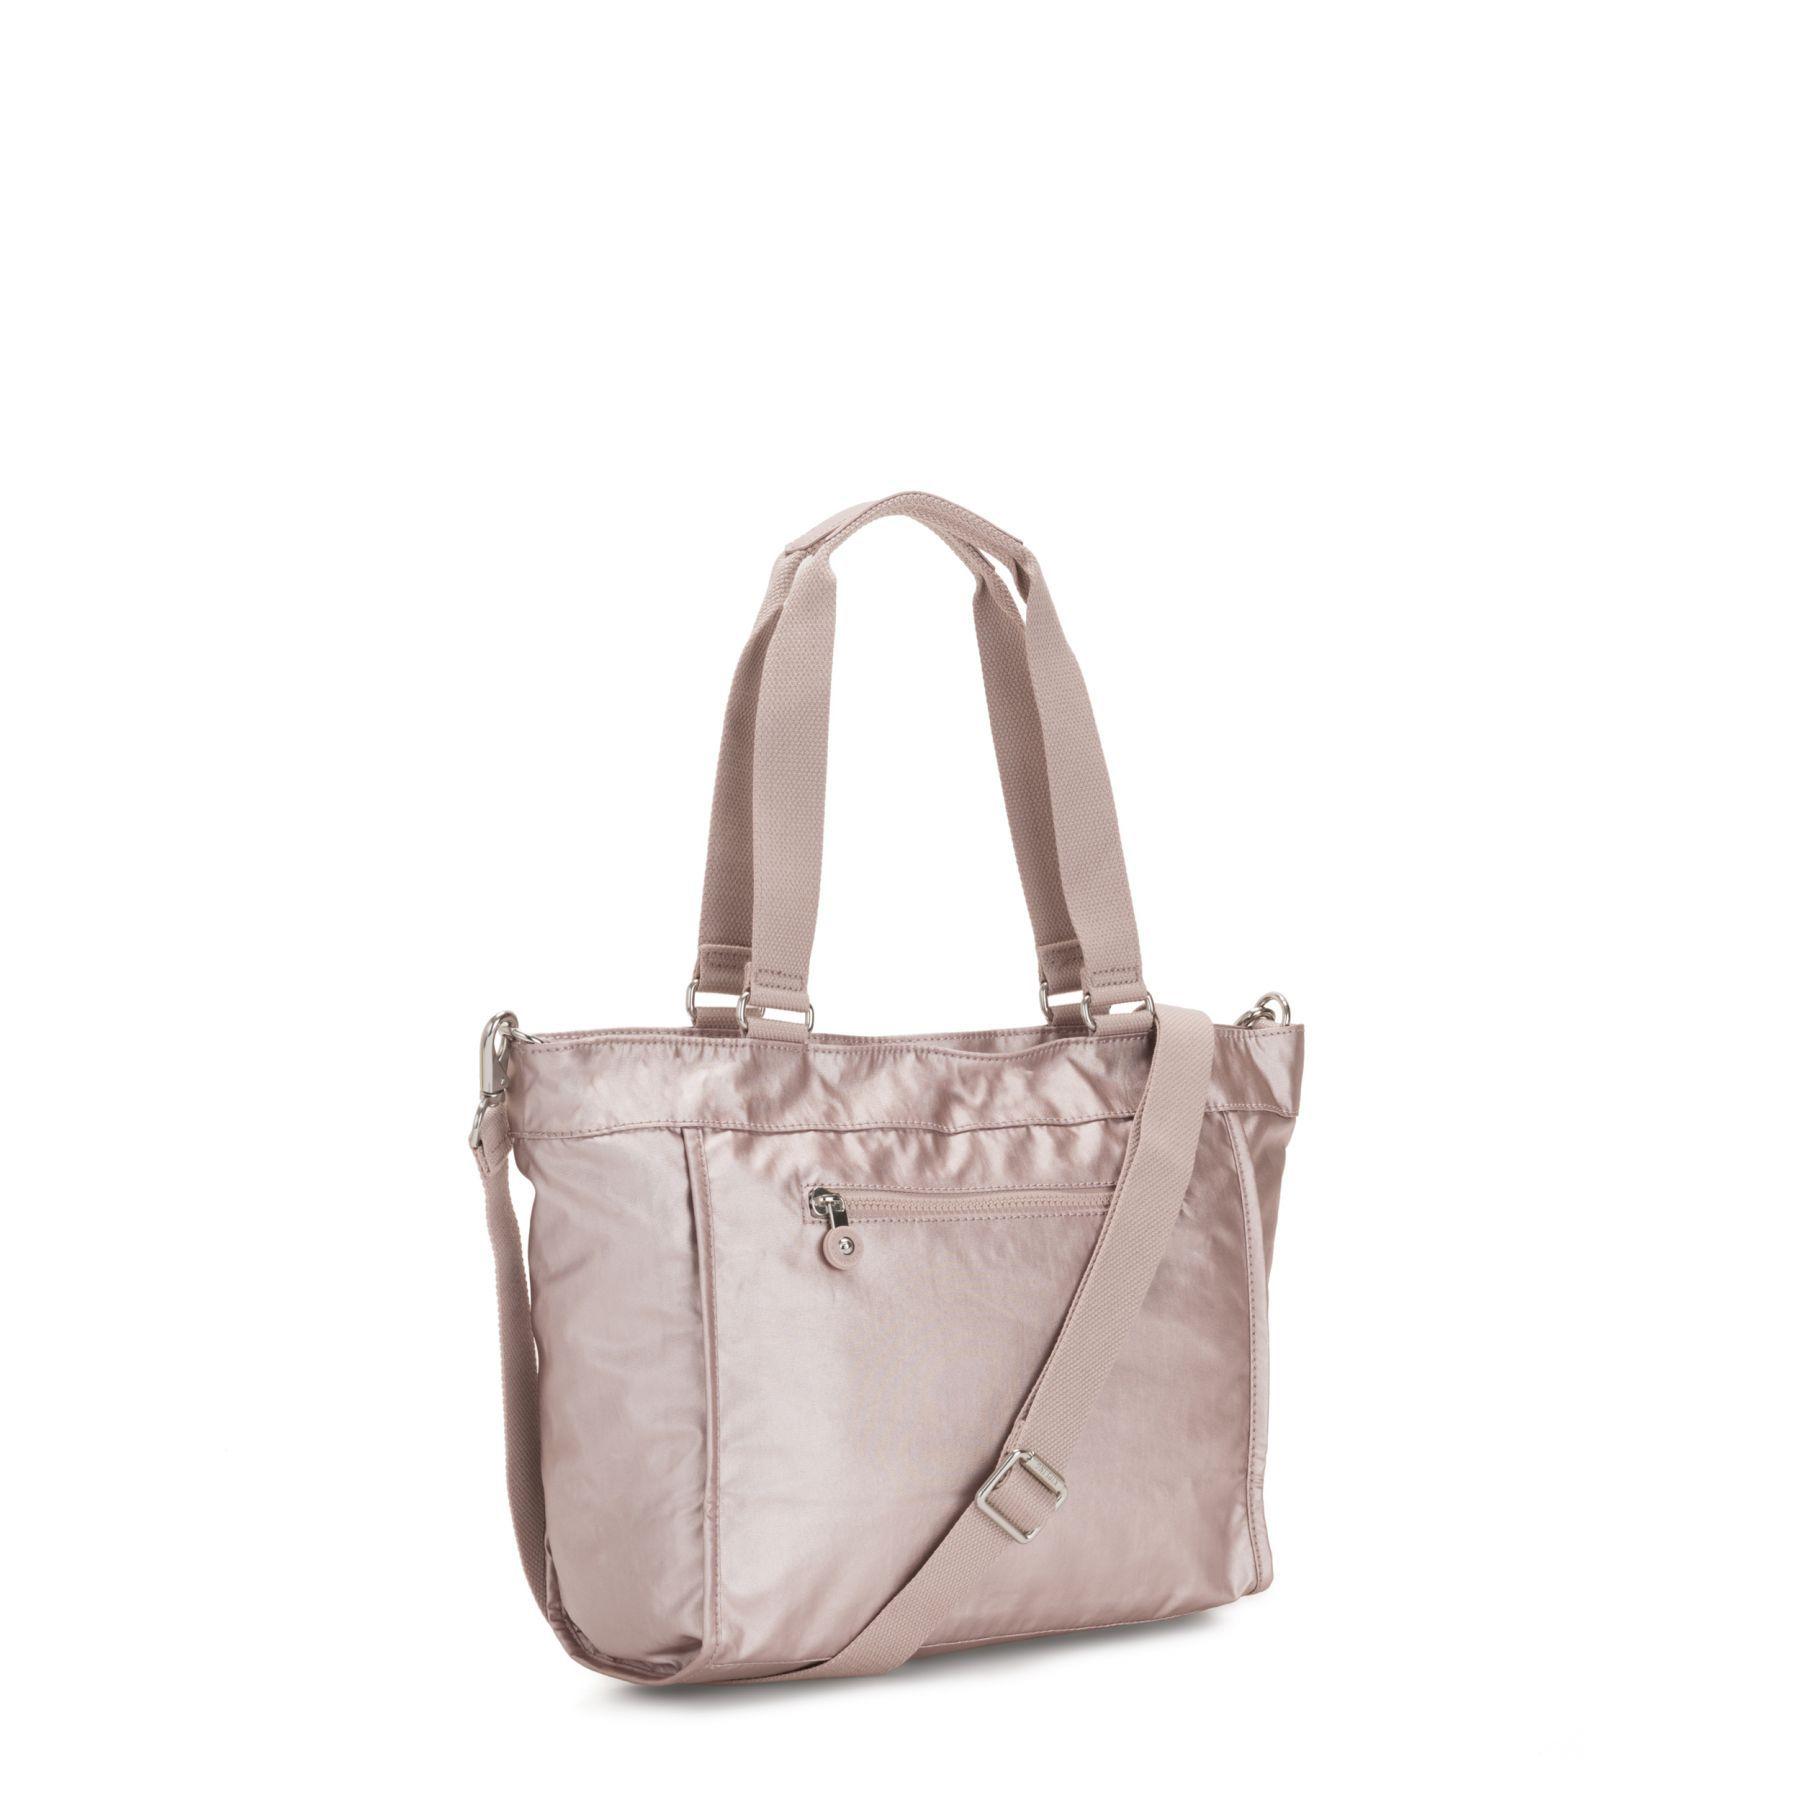 Bolsa de Ombro New Shopper Kipling Metallic Rose